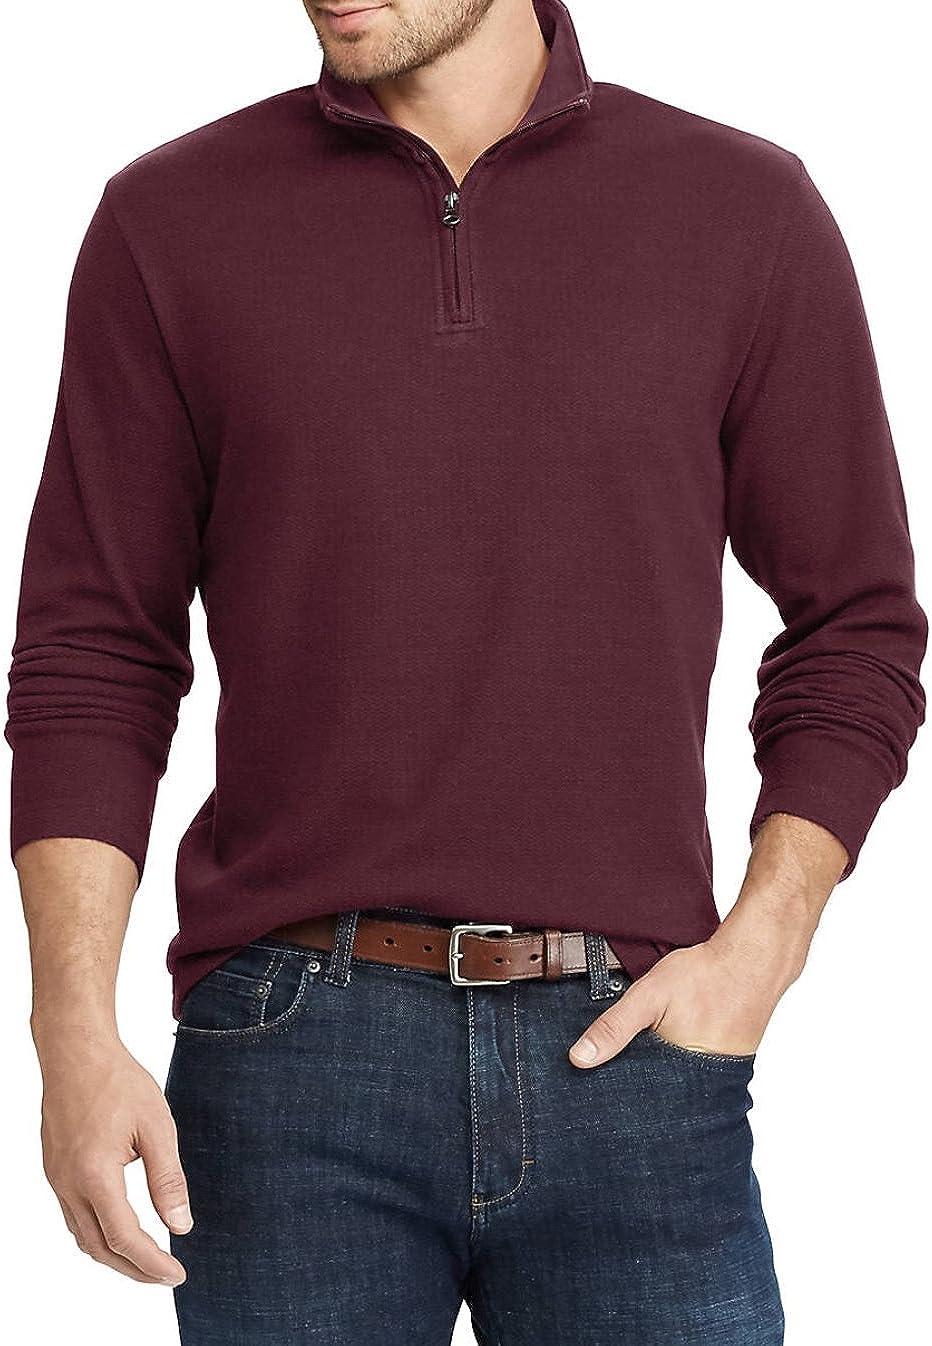 Chaps Men's Long Sleeve Herringbone Knit Pullover Shirt